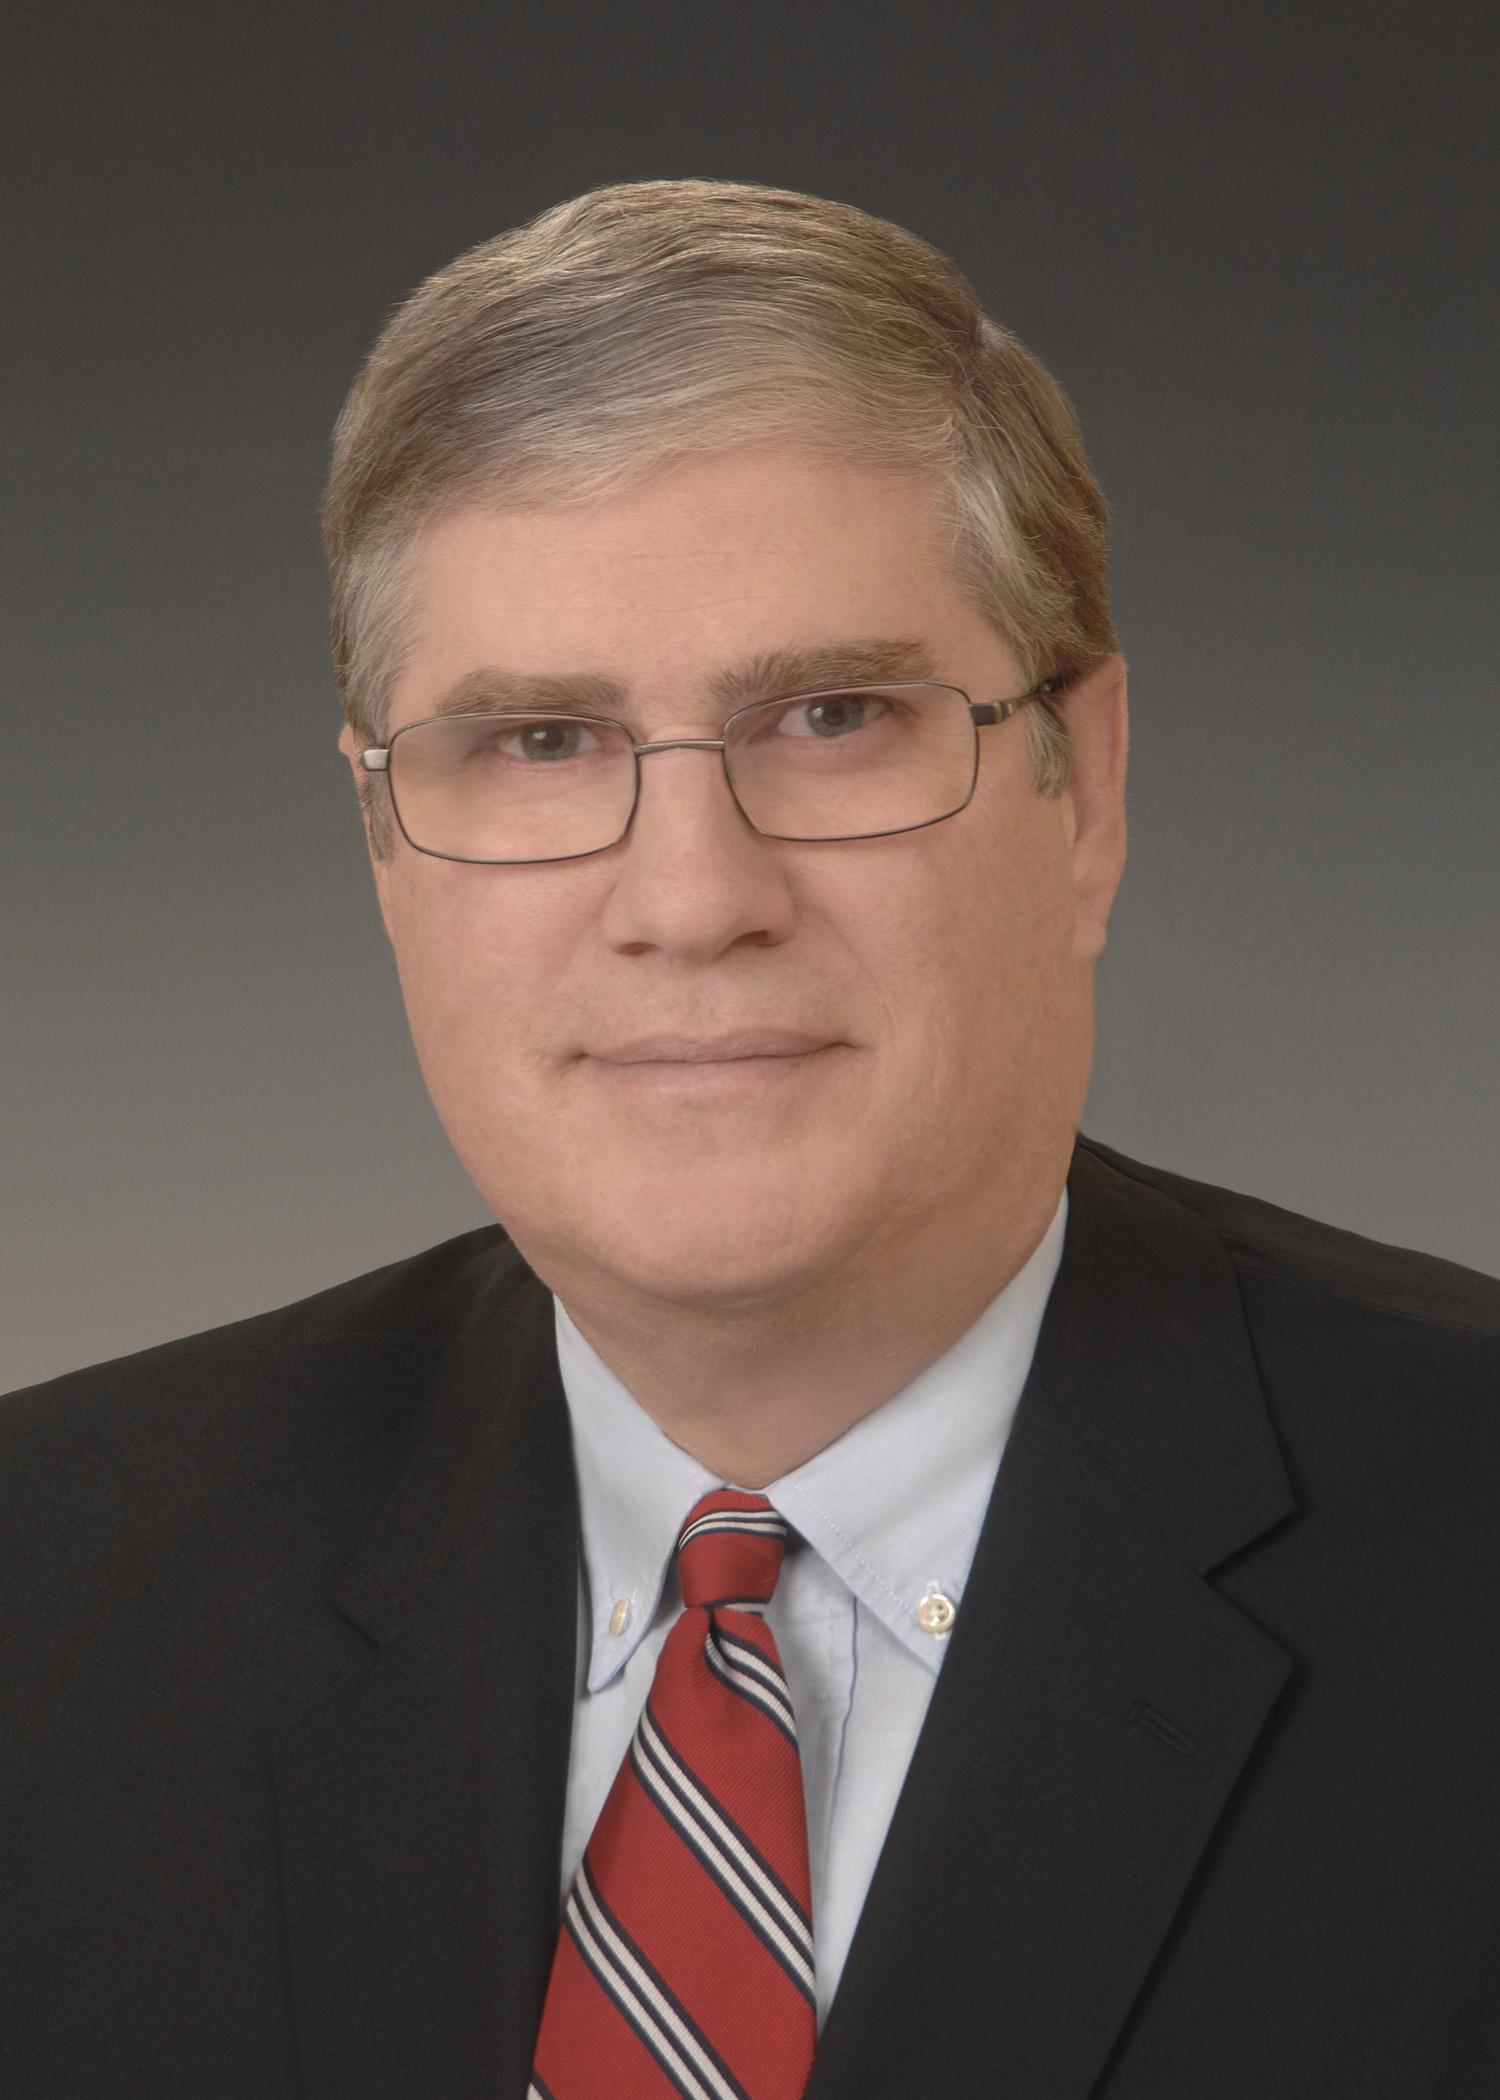 Mark J. Meiklejohn Headshot